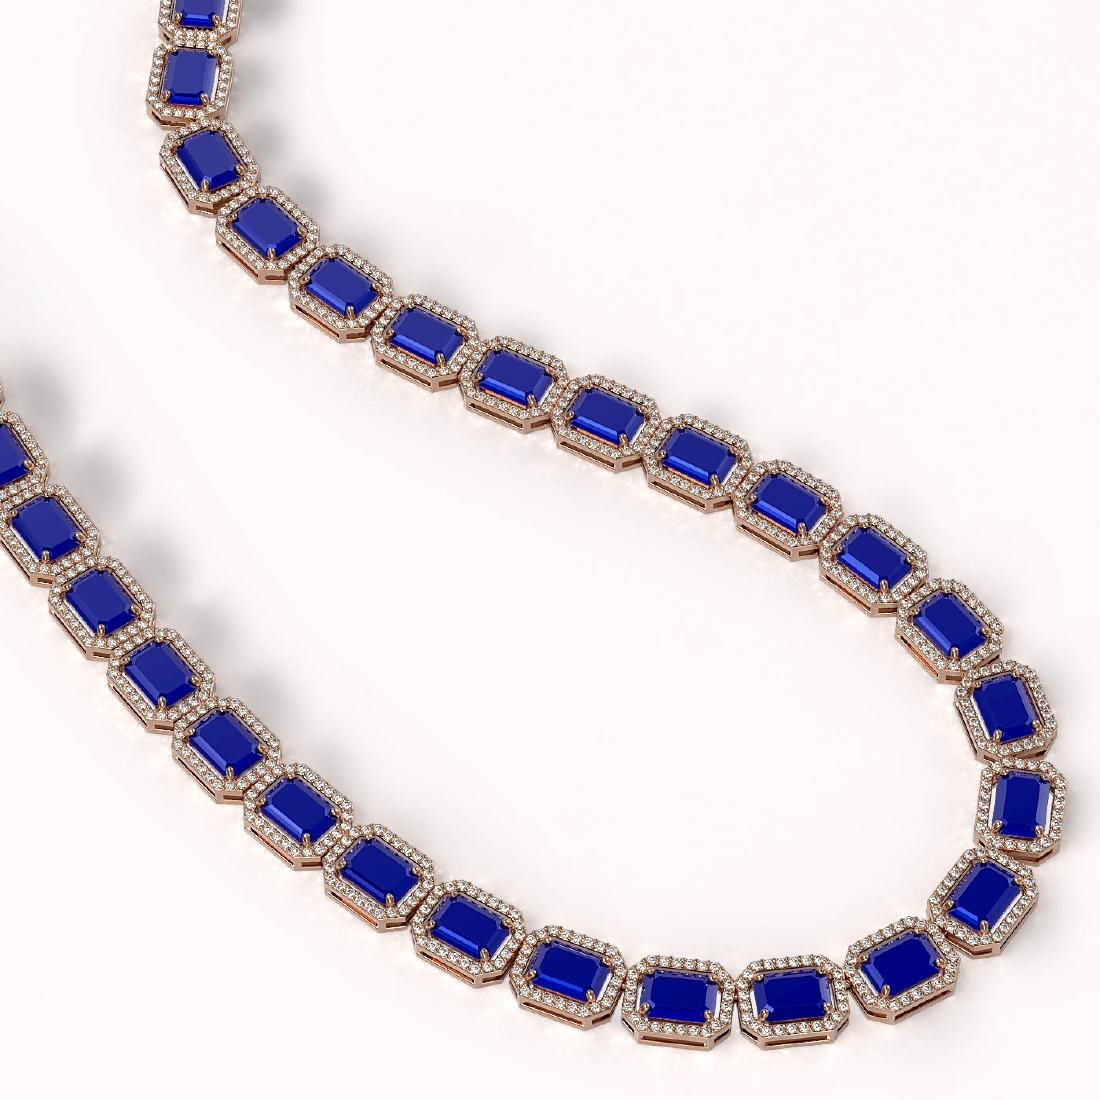 58.59 CTW Sapphire & Diamond Halo Necklace 10K Rose - 2